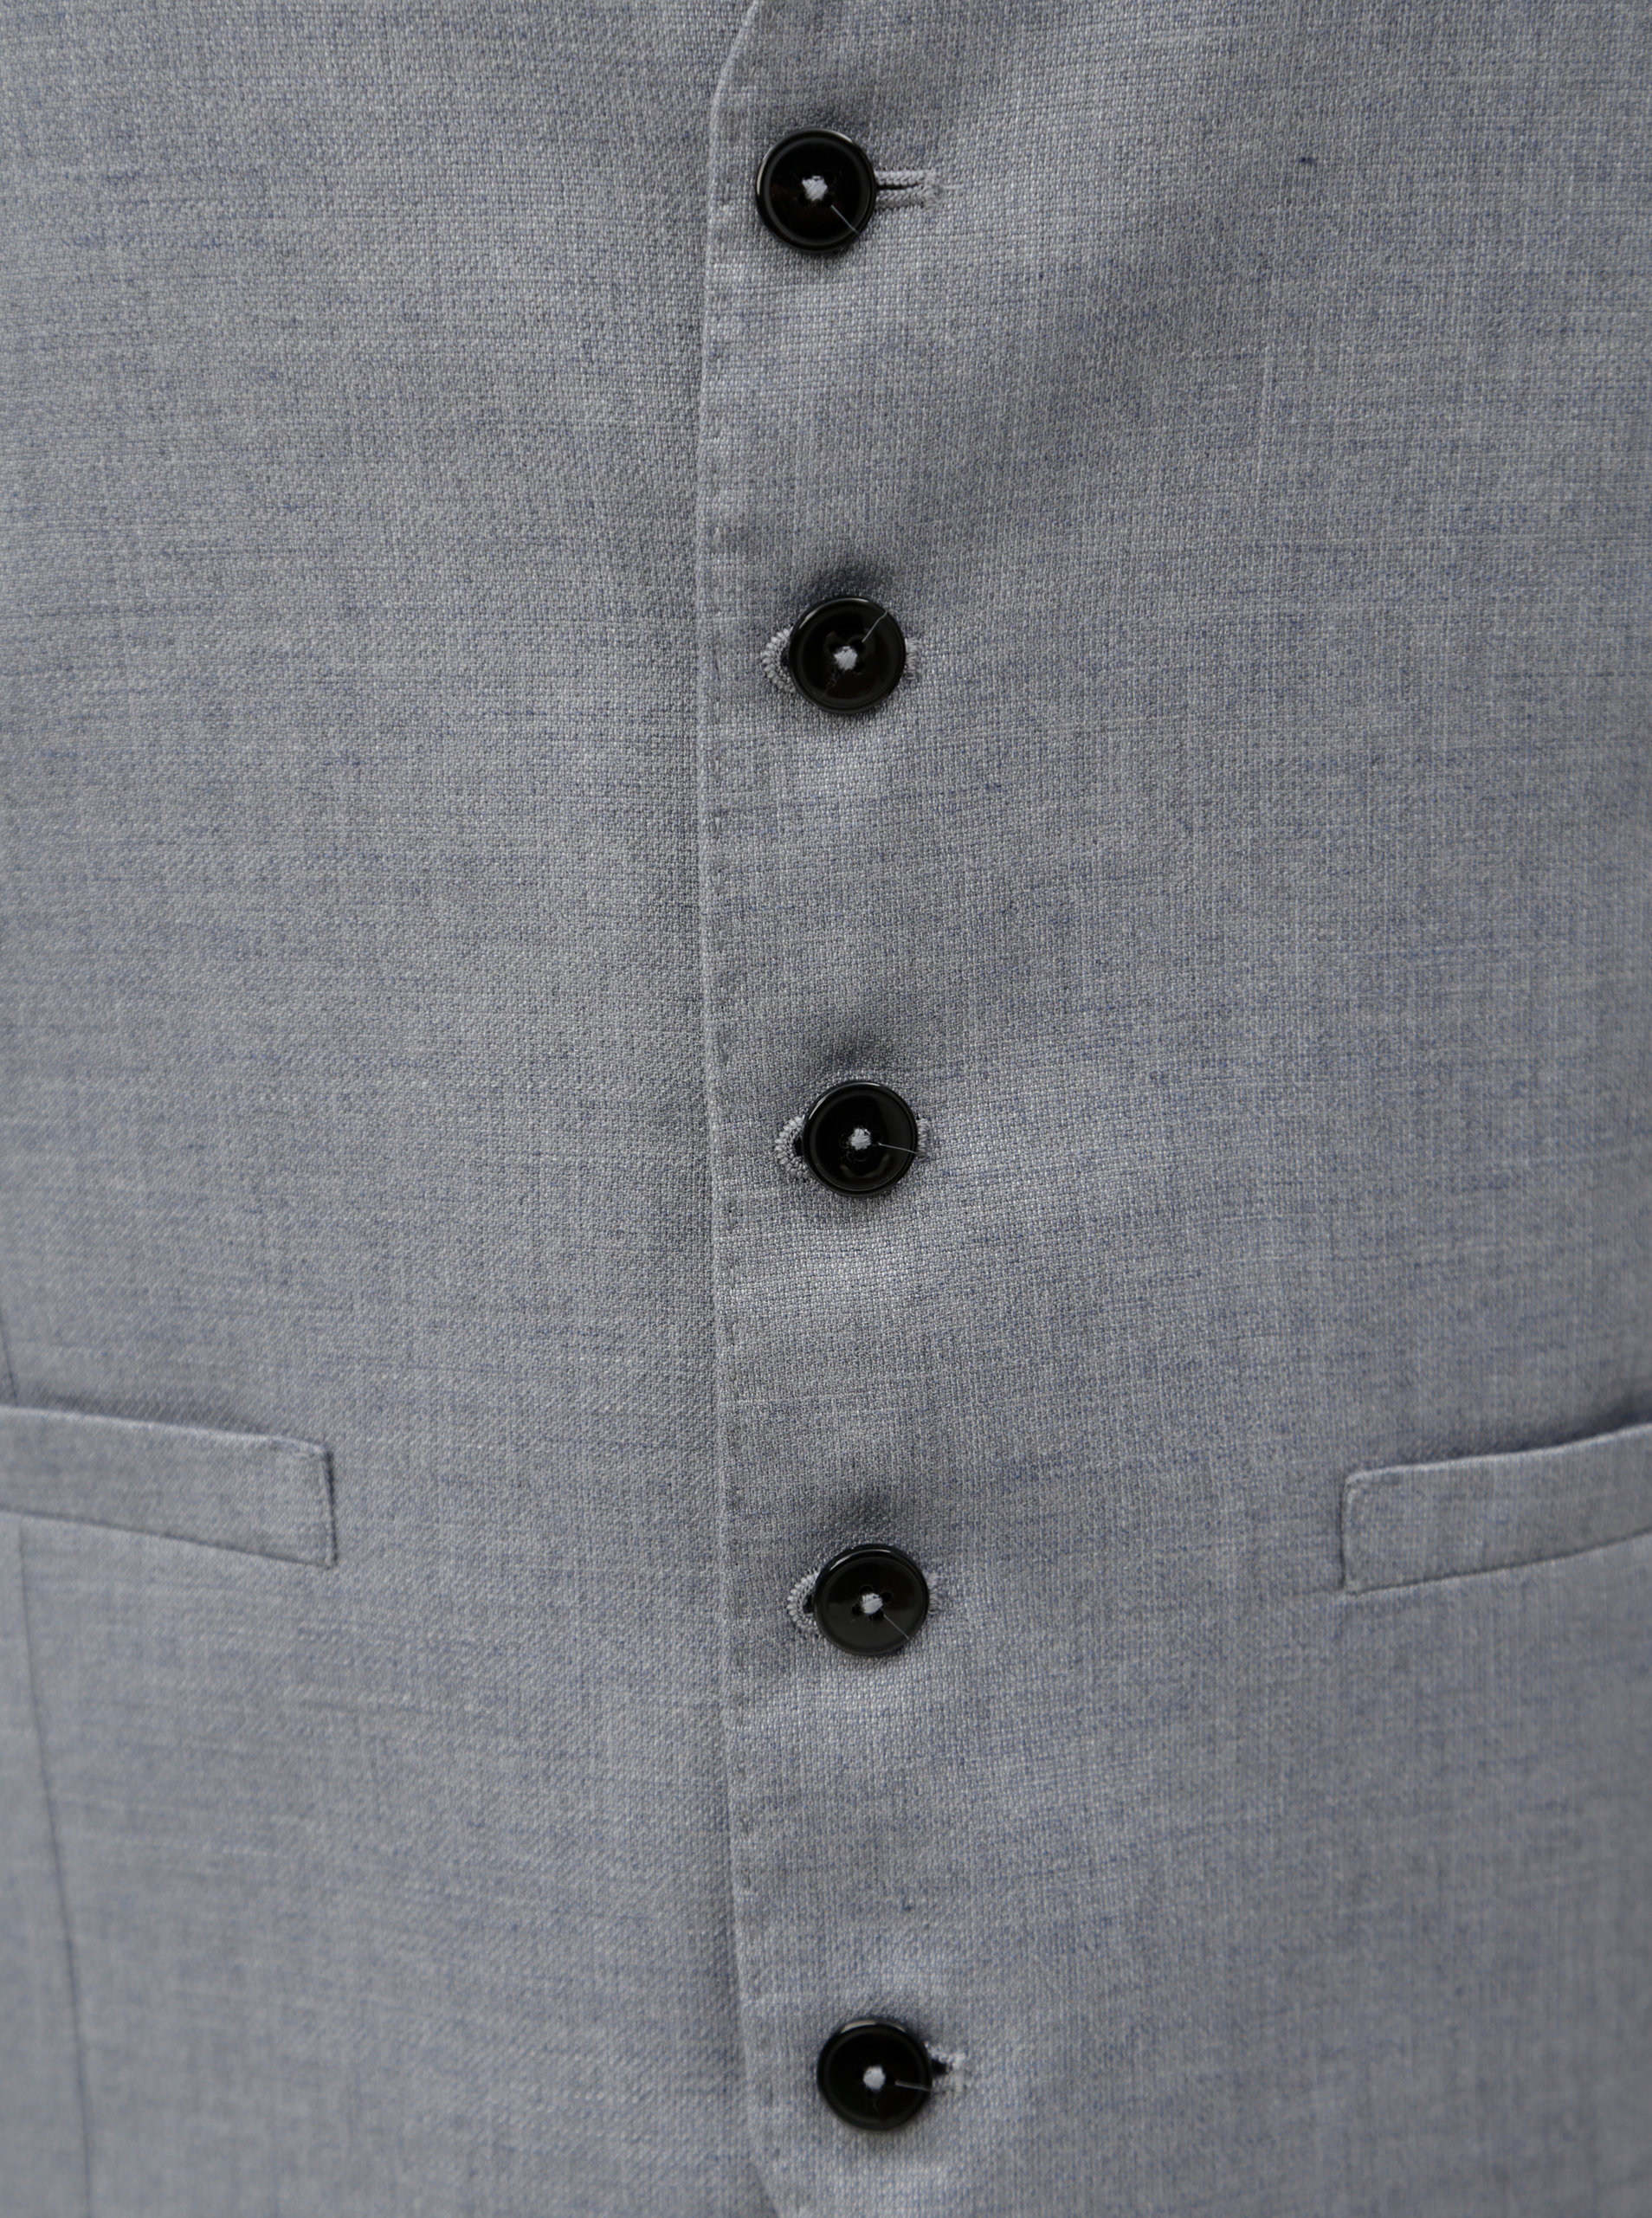 adf1aaa39a8 Světle šedá formální vesta Burton Menswear London ...